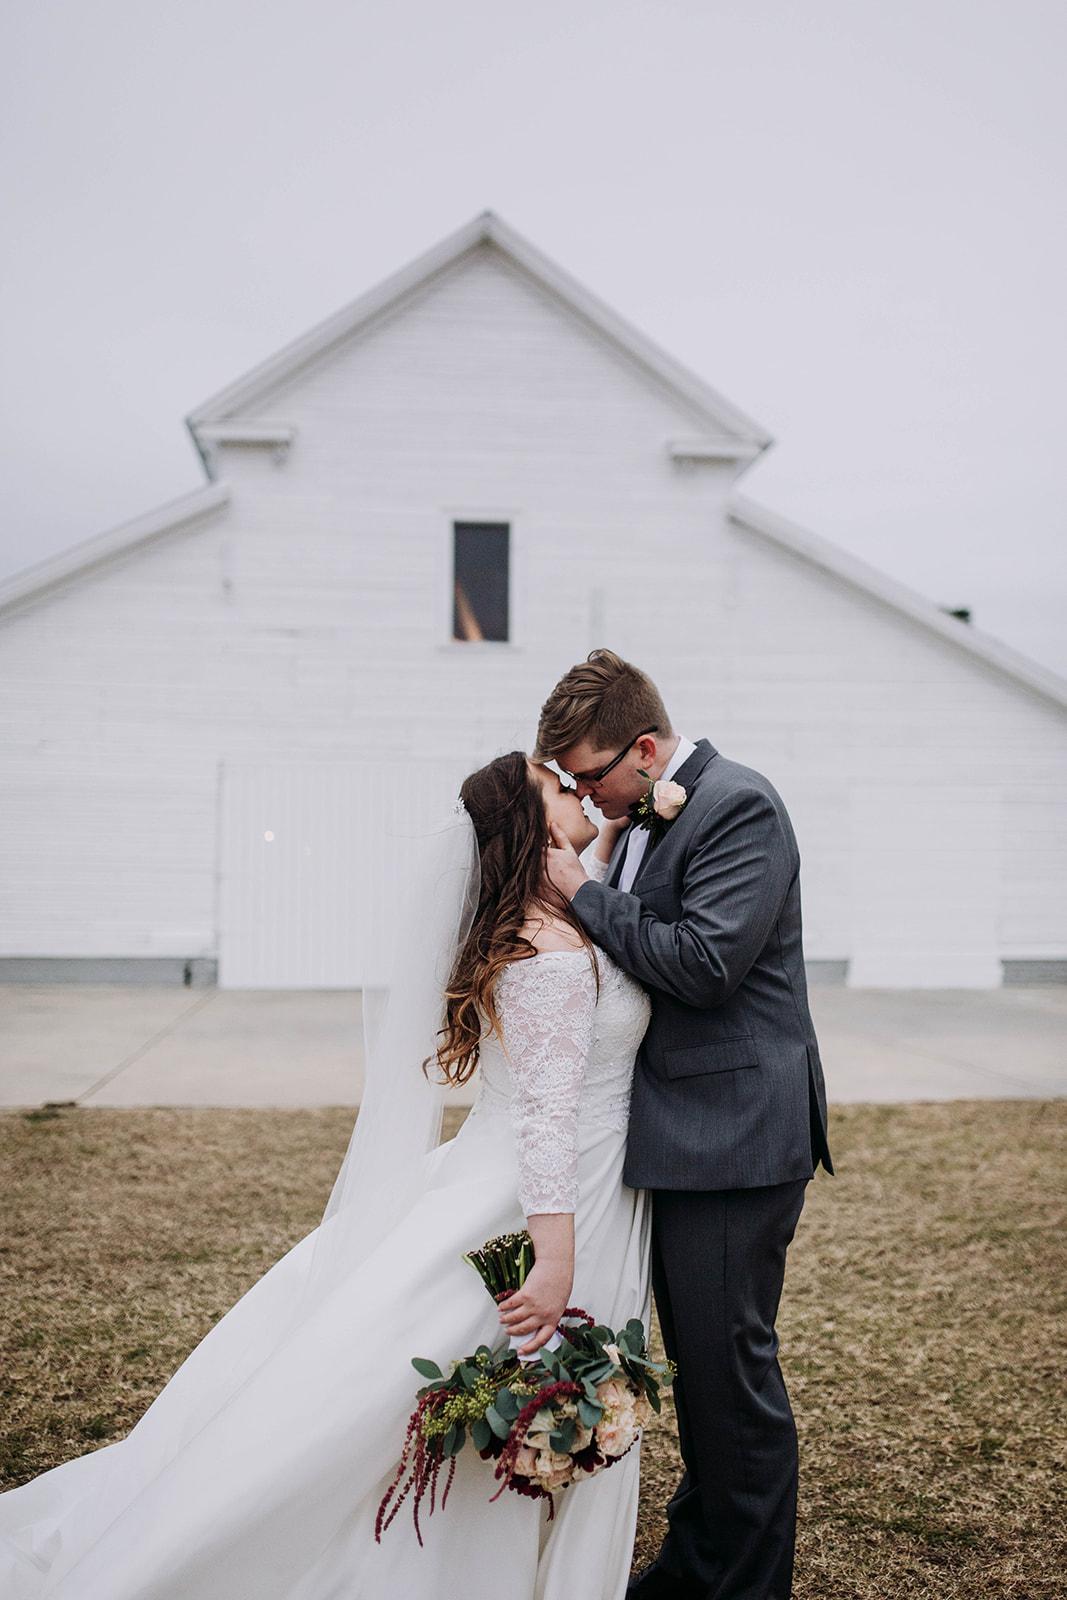 kissing in fron of barn.jpg